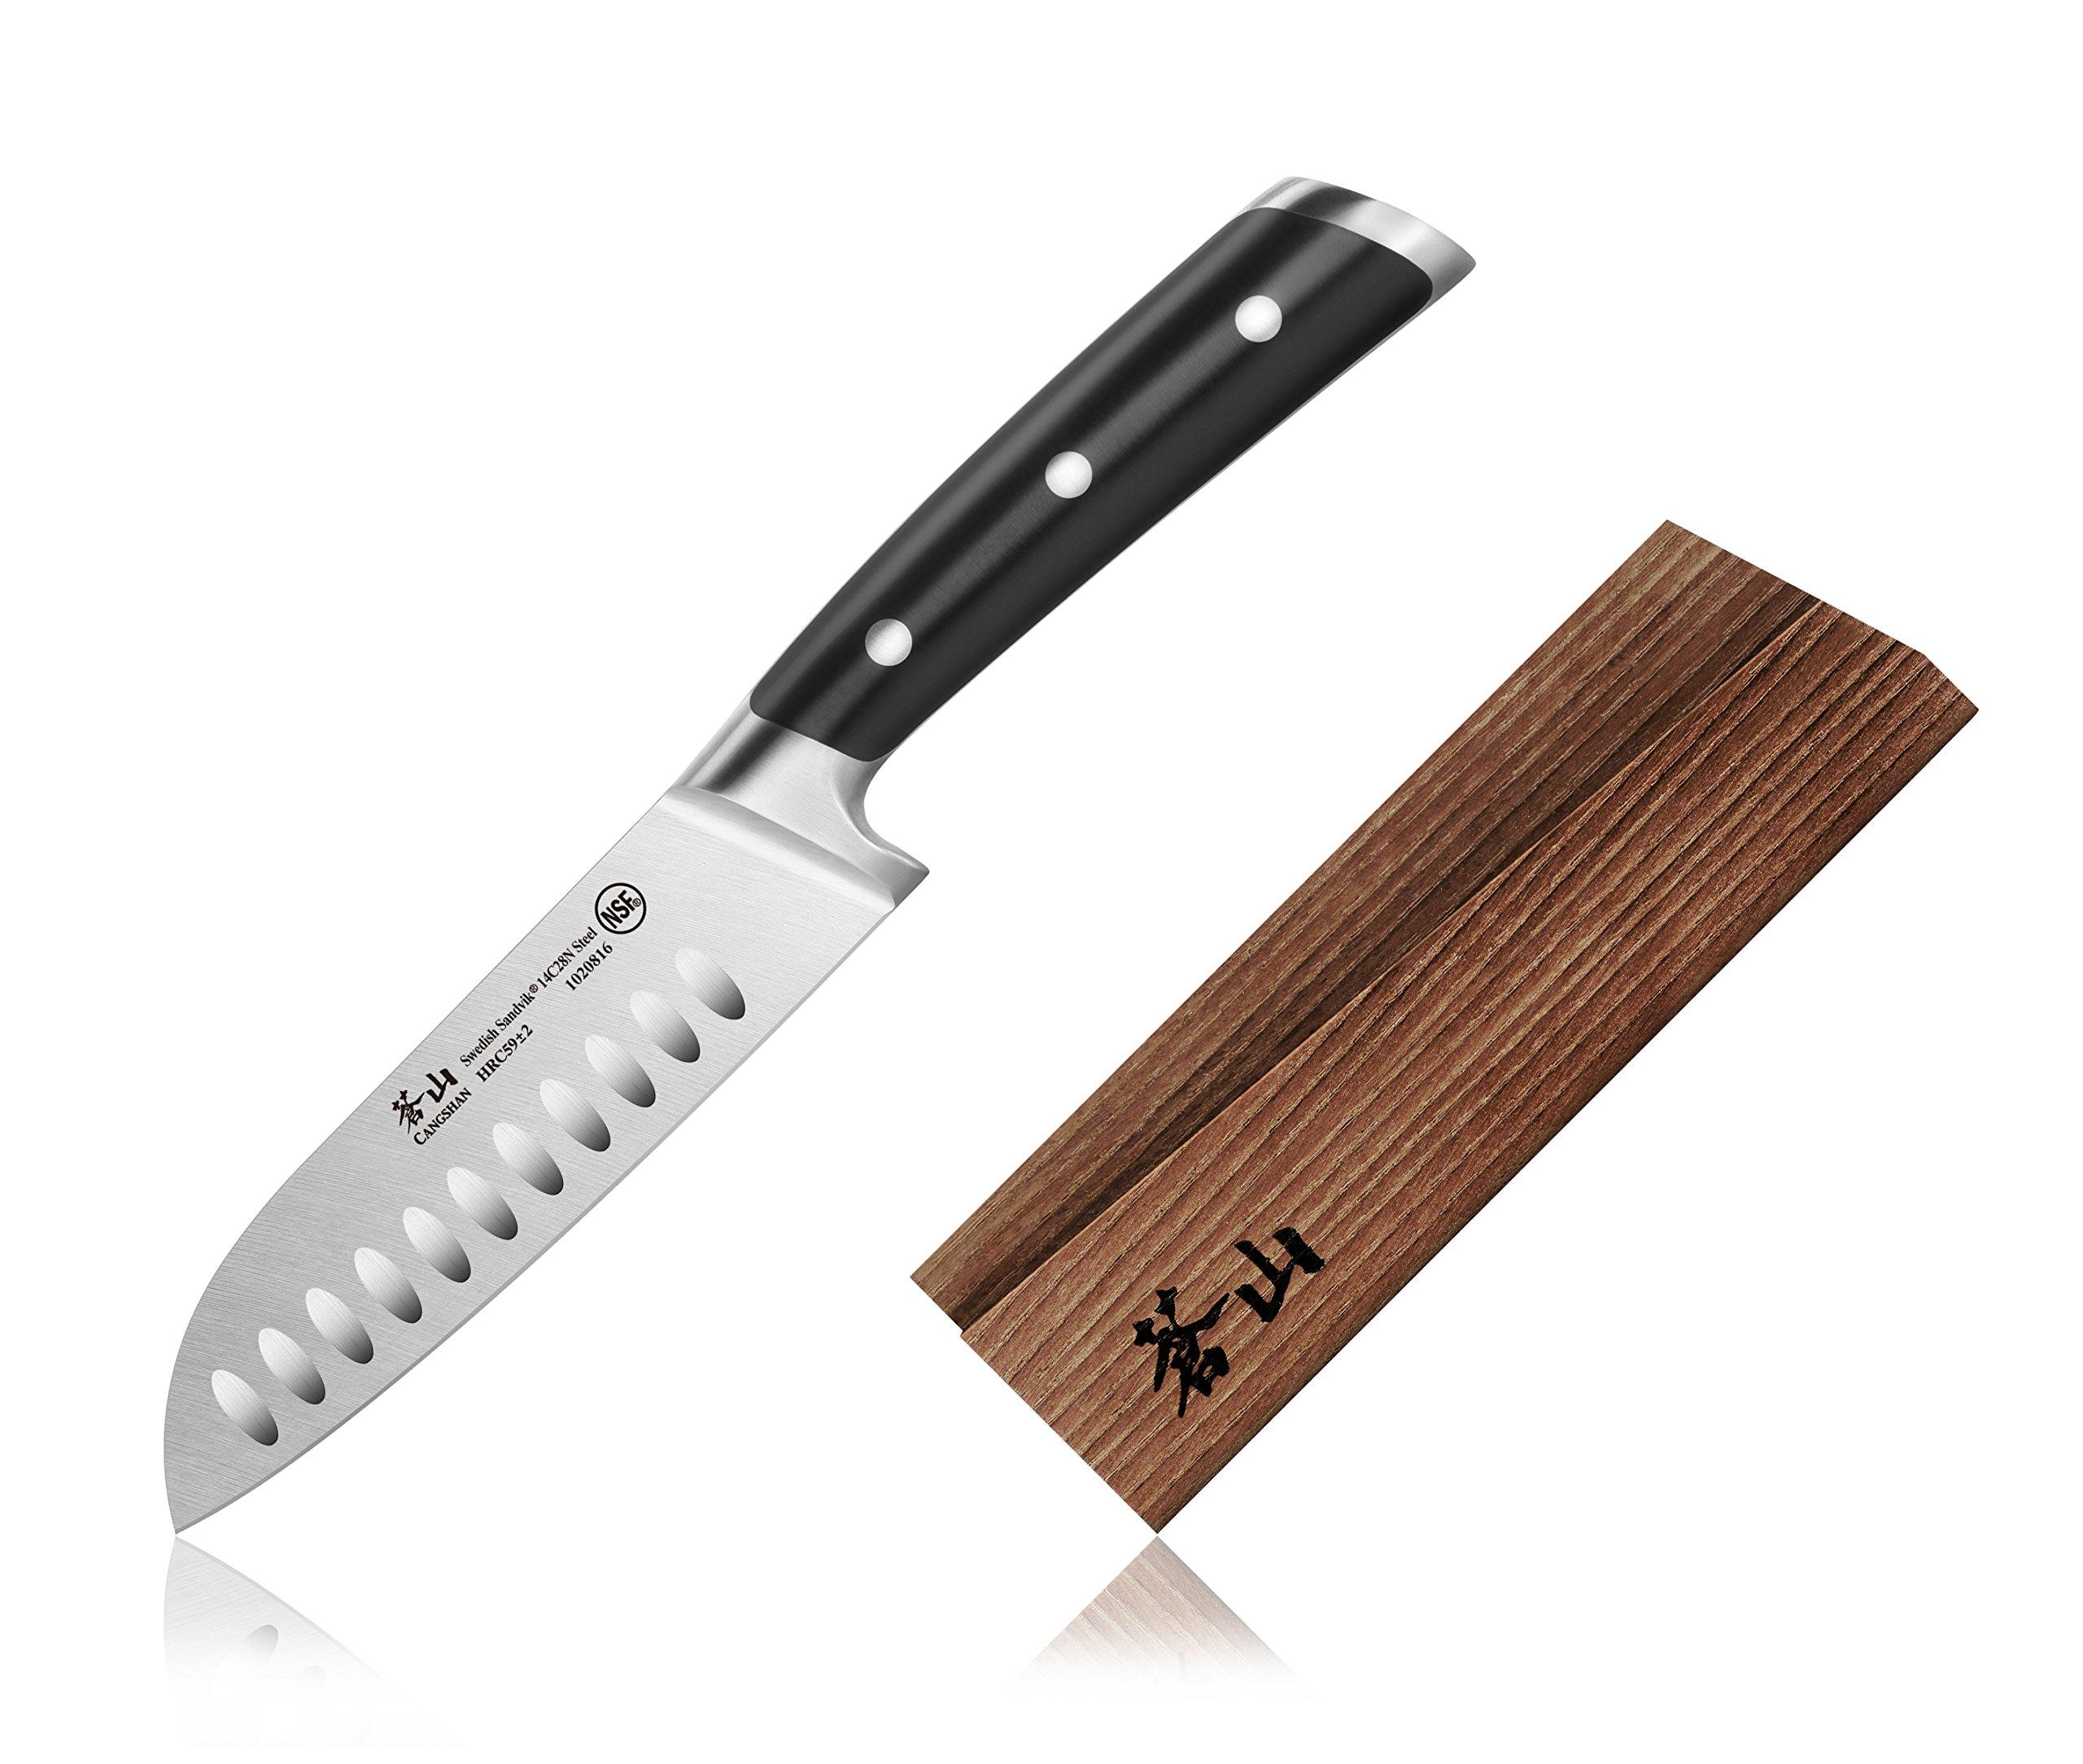 Cangshan TS Series 1020823 Swedish Sandvik 14C28N Steel Forged 5-Inch Santoku Knife and Wood Sheath Set